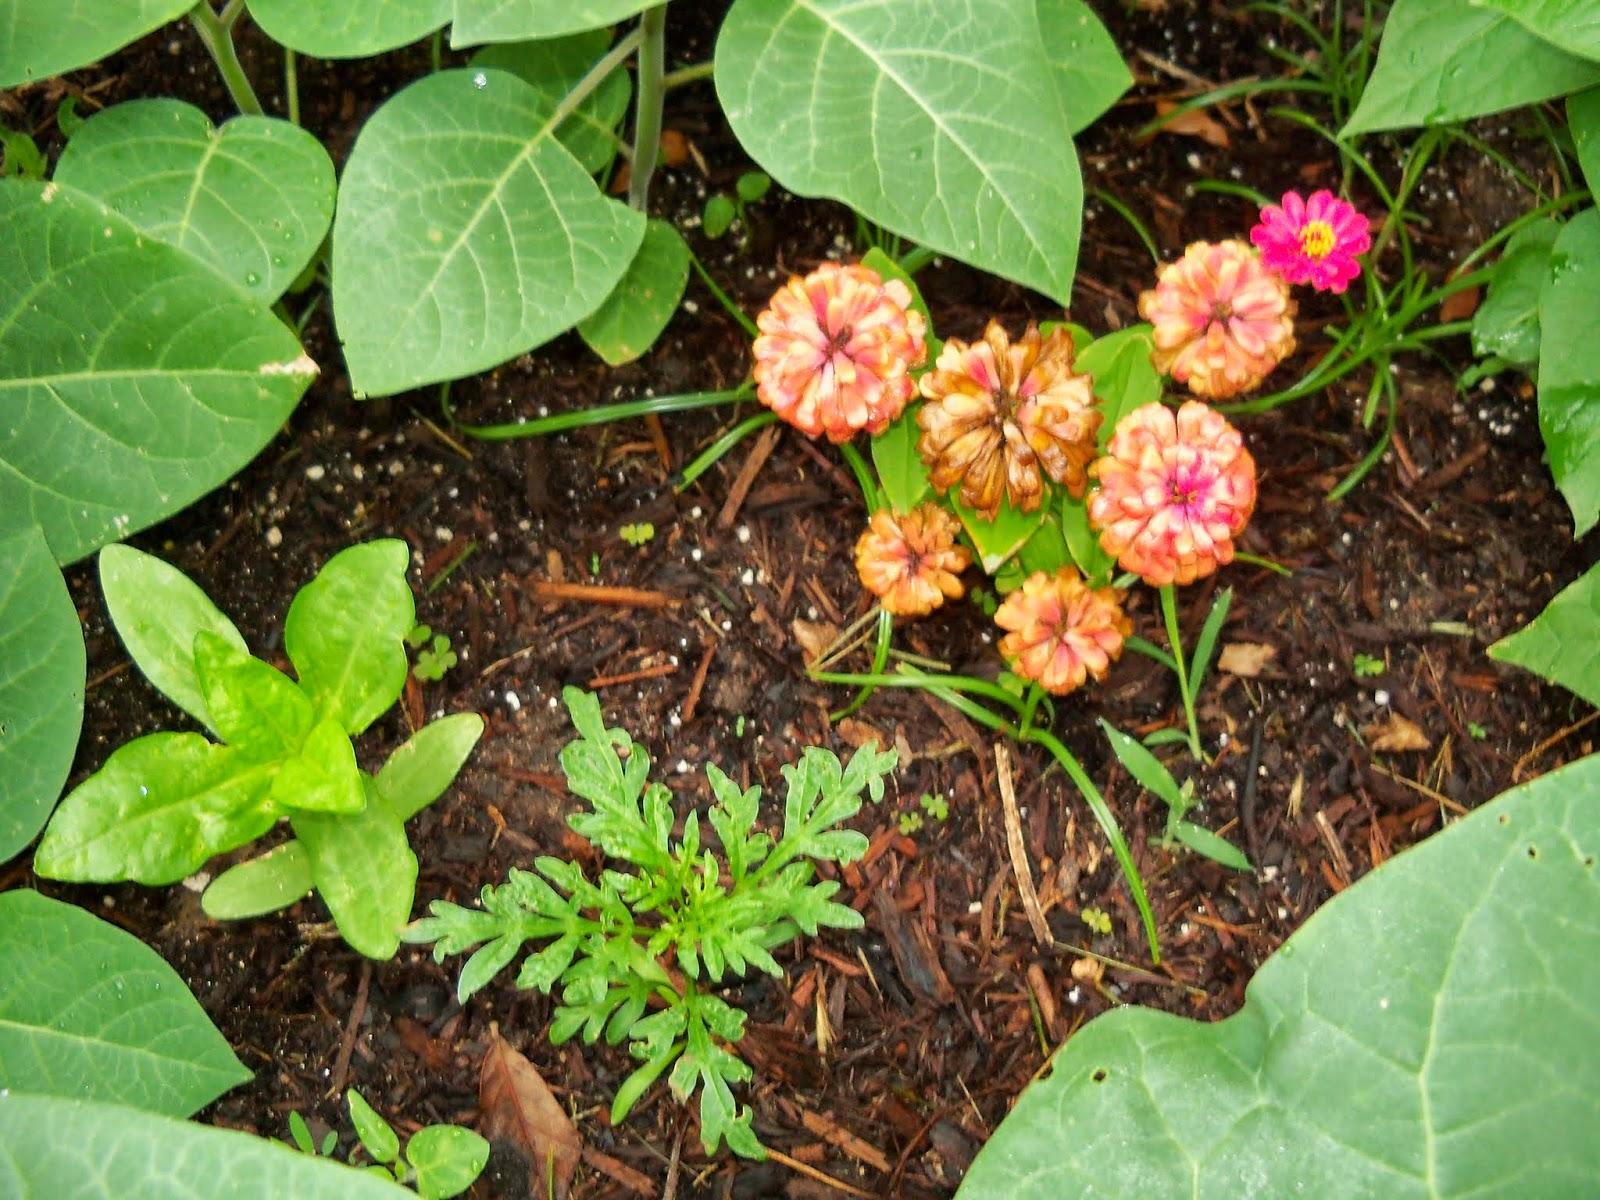 Gardening 2014 - 116_1842.JPG